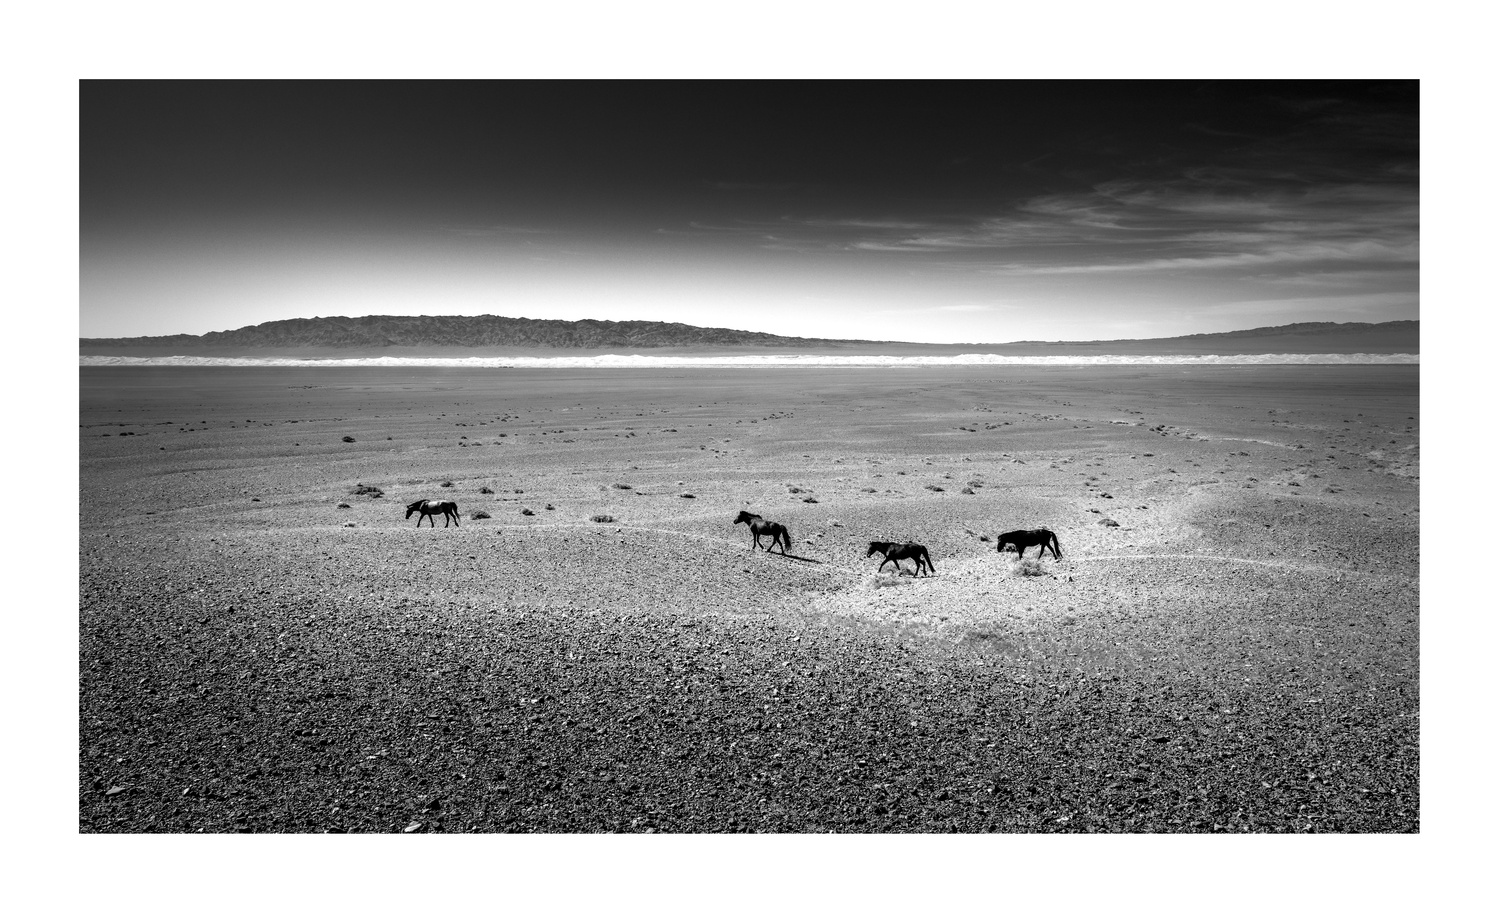 Gobi desert II by Josep María Orengo